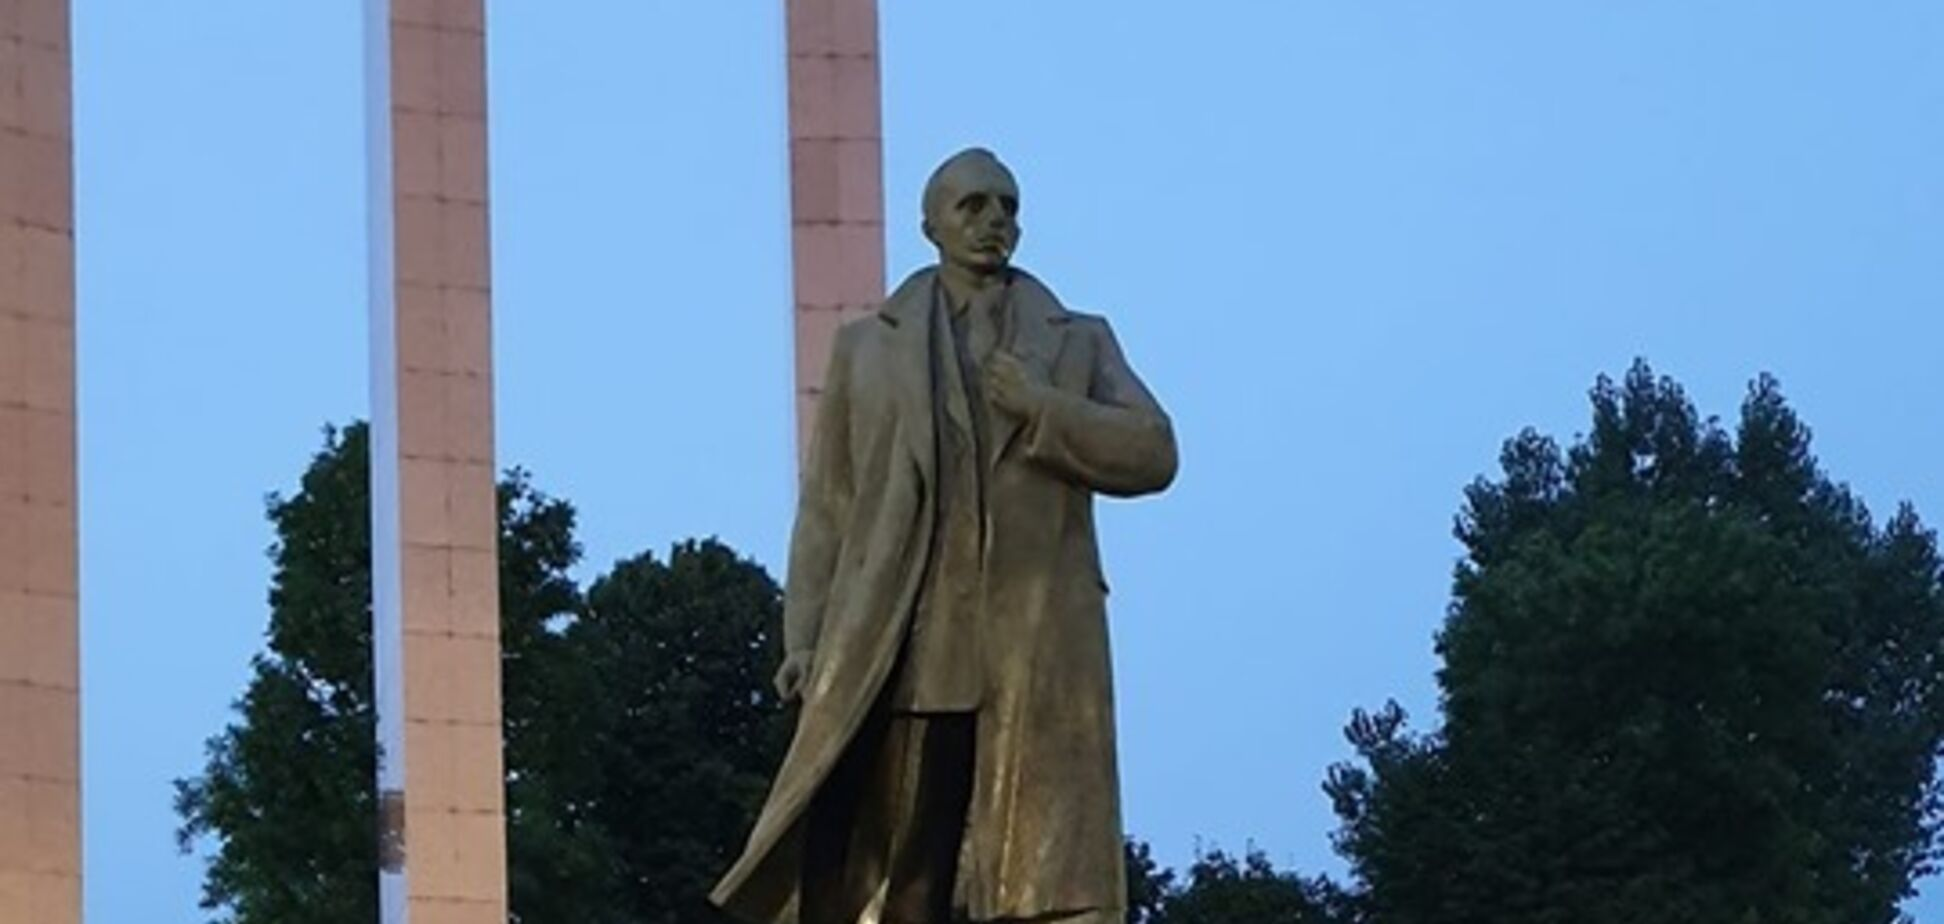 Во Львове поймали фаната СССР, испортившего памятник Бандере: фото и видео